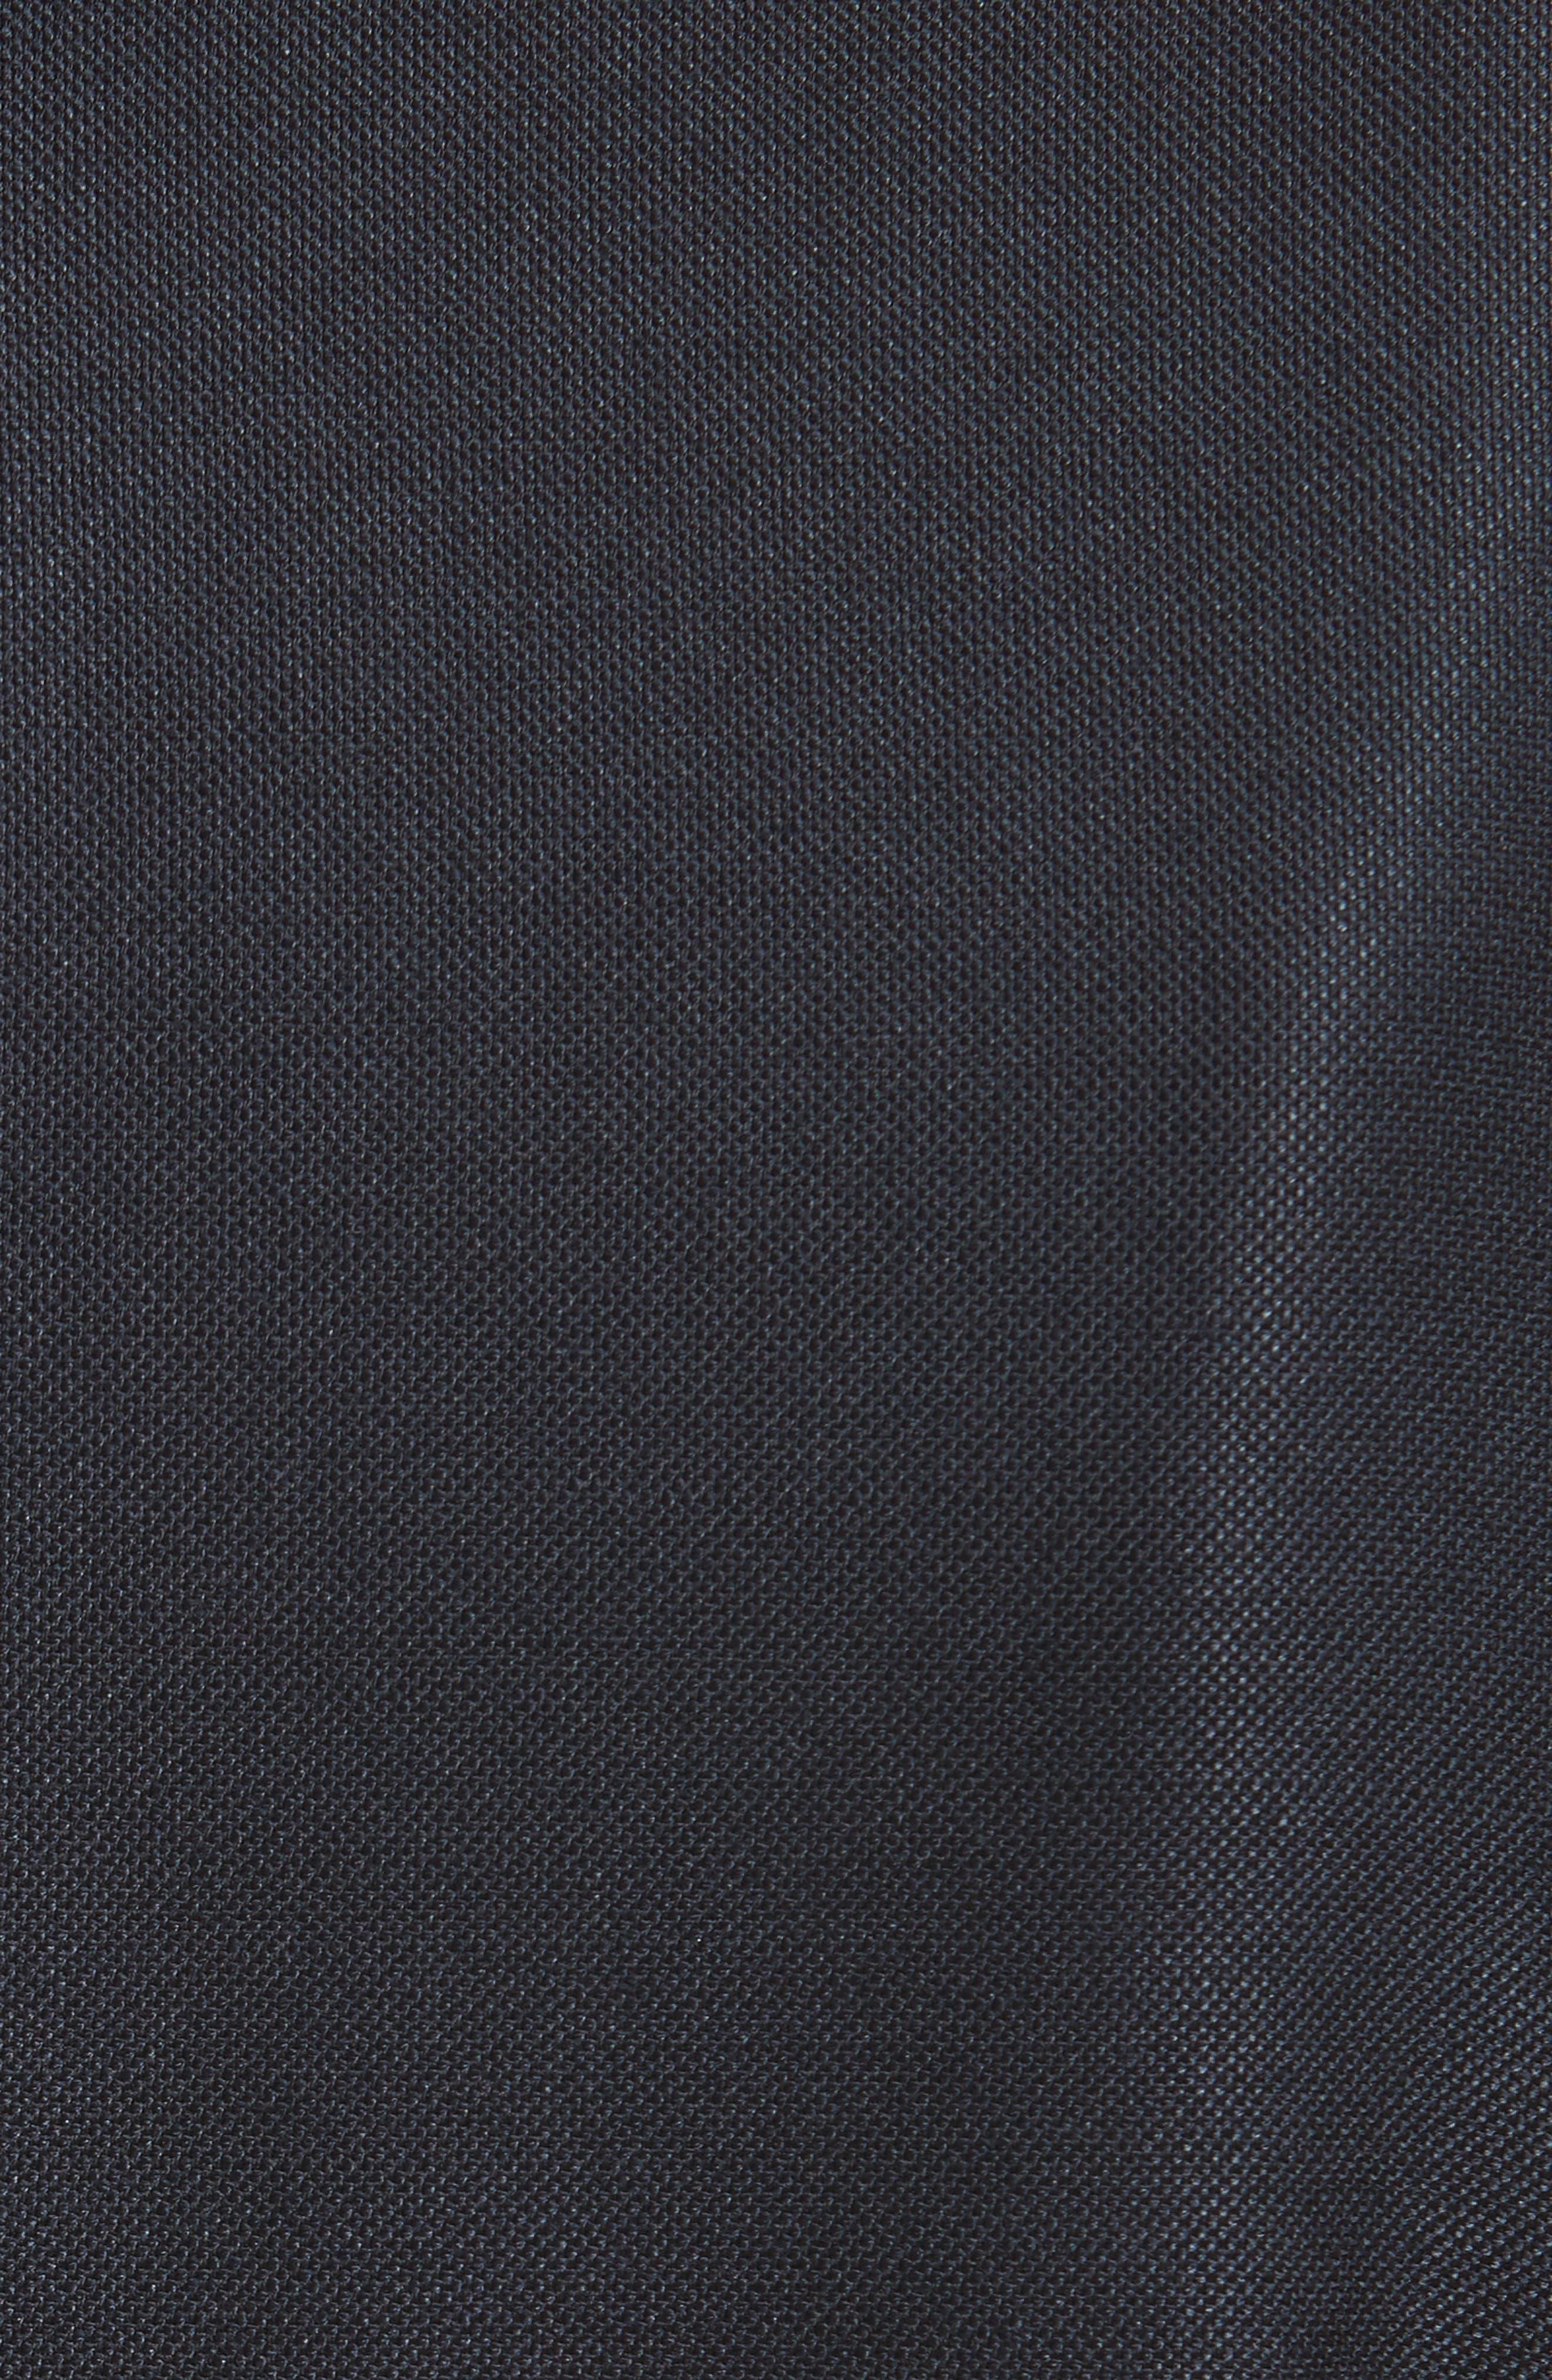 Stretch Birdseye Sheath Dress,                             Alternate thumbnail 6, color,                             Navy/ Caviar